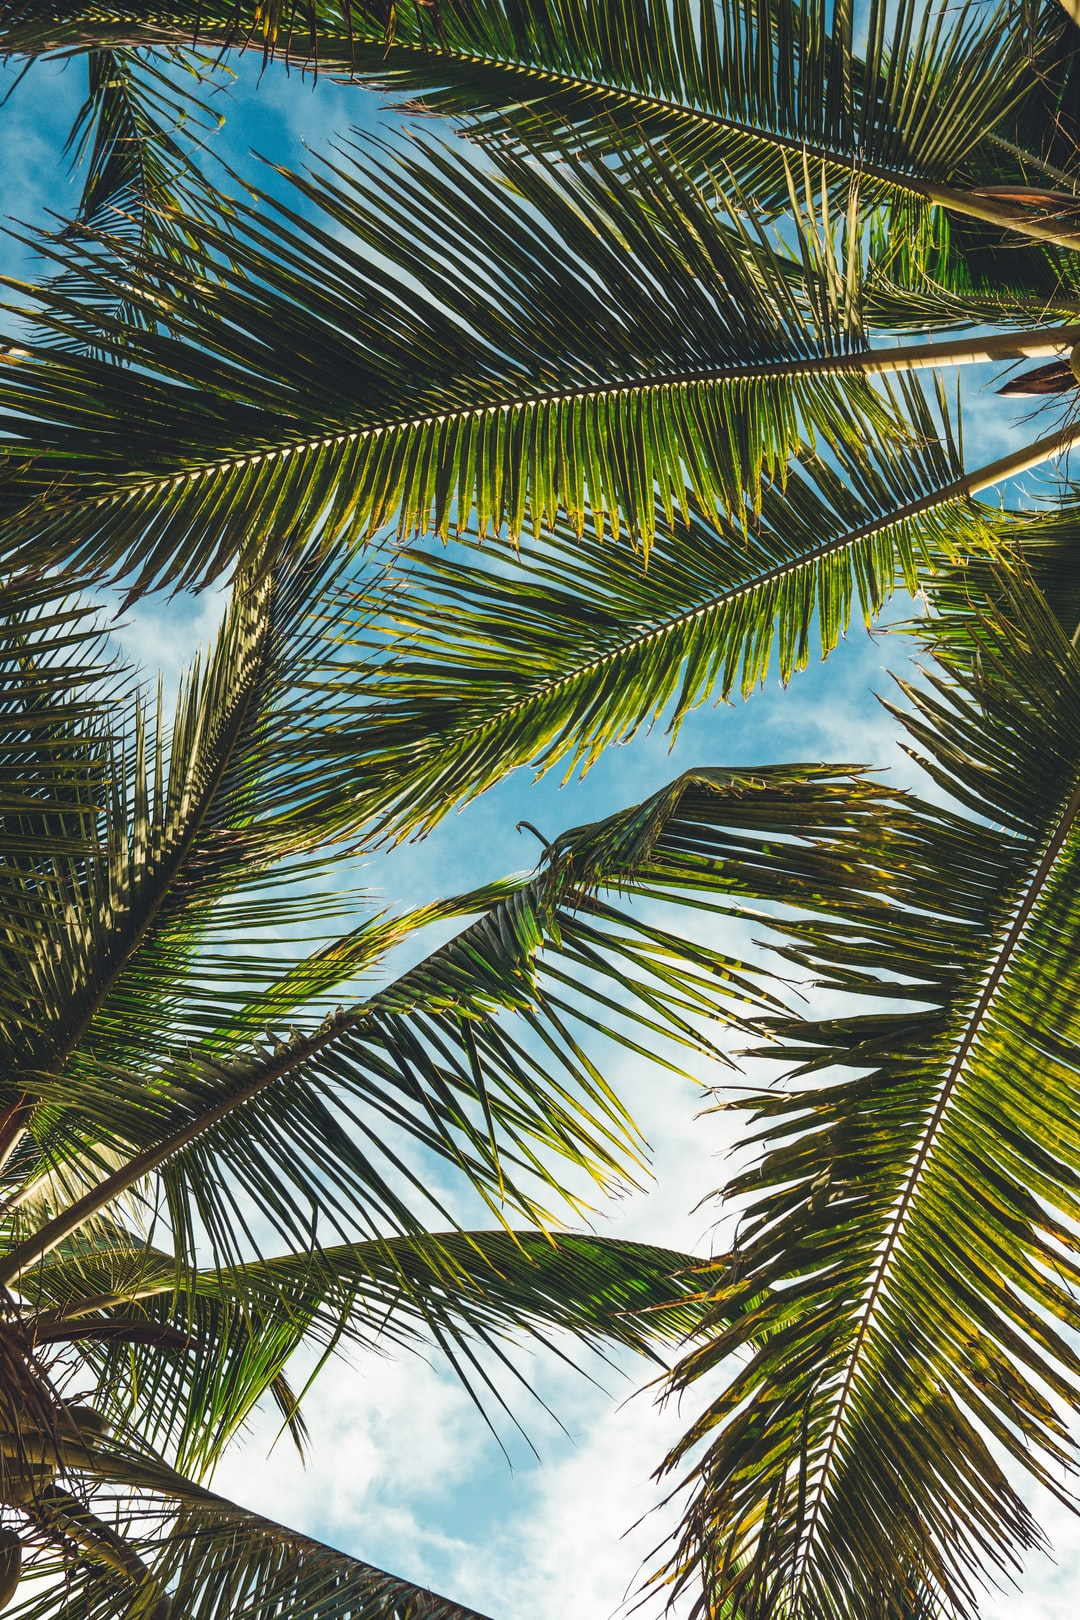 Tropical Wallpapers Free Hd Download 500 Hq Unsplash